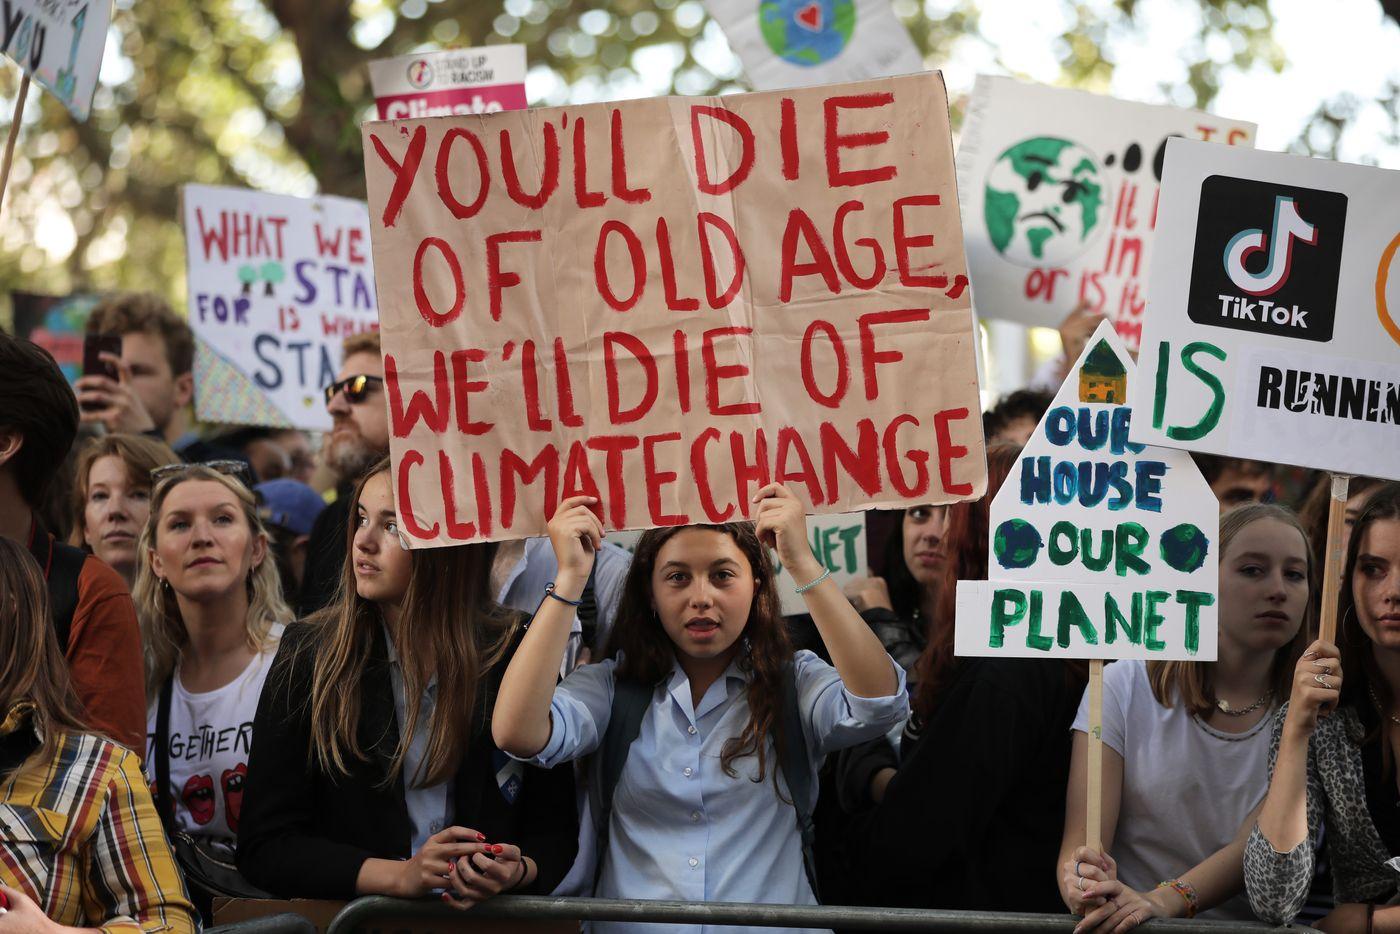 democratic platform, environment, greenpeace usa